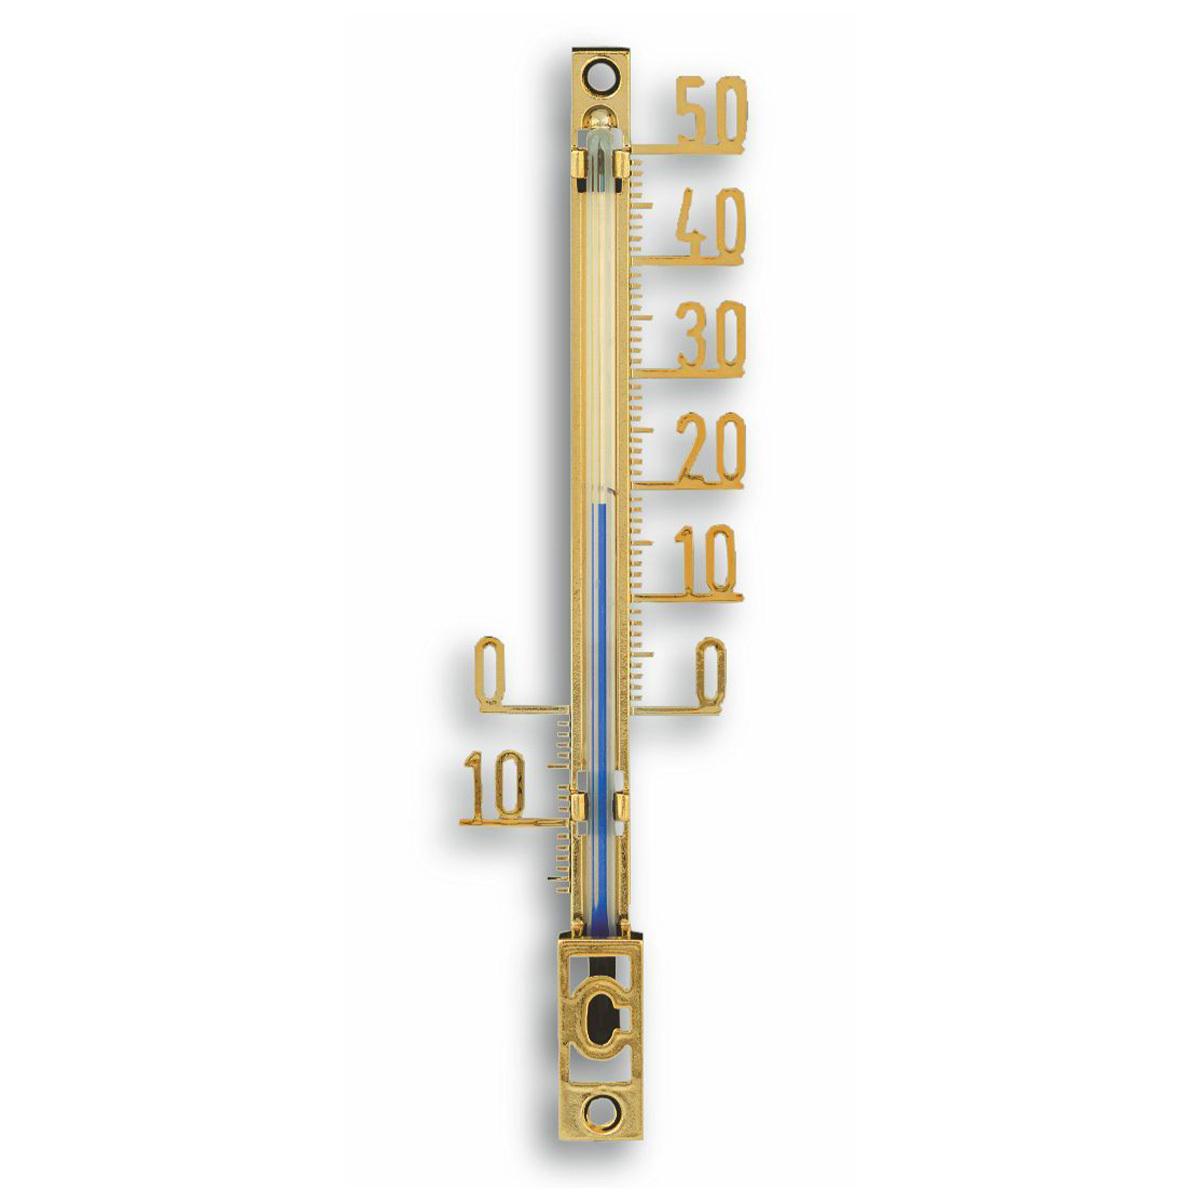 12-6000-53-analoges-aussenthermometer-1200x1200px.jpg